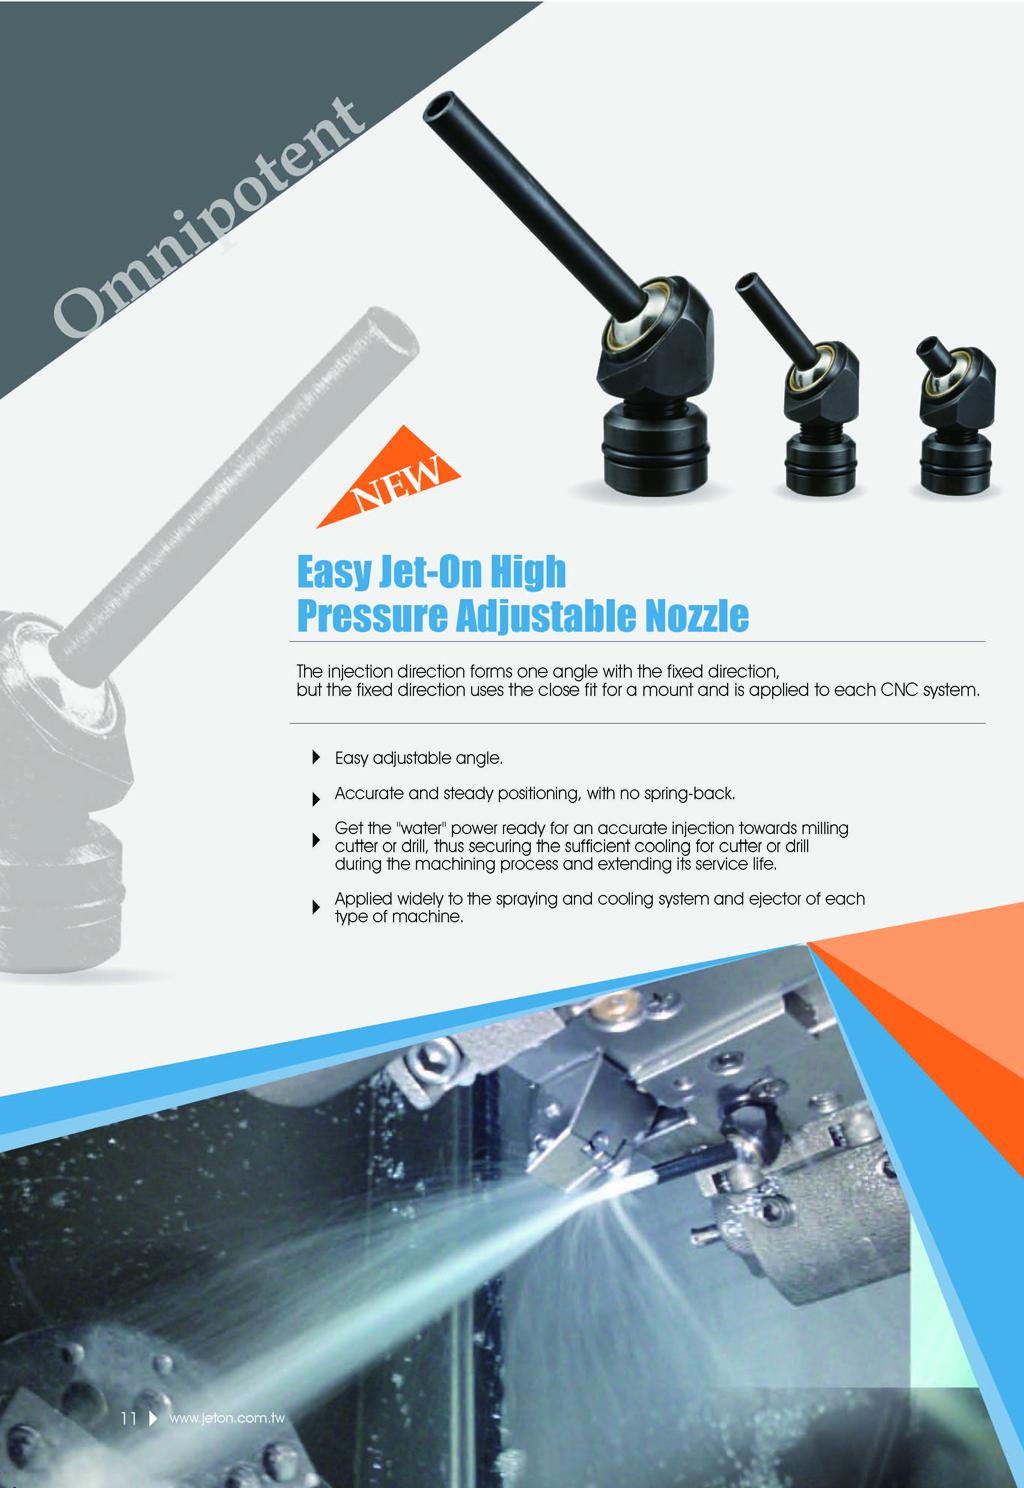 JETON Inclined-Injection High Pressure Adjustable Nozzle JTAM-10-50